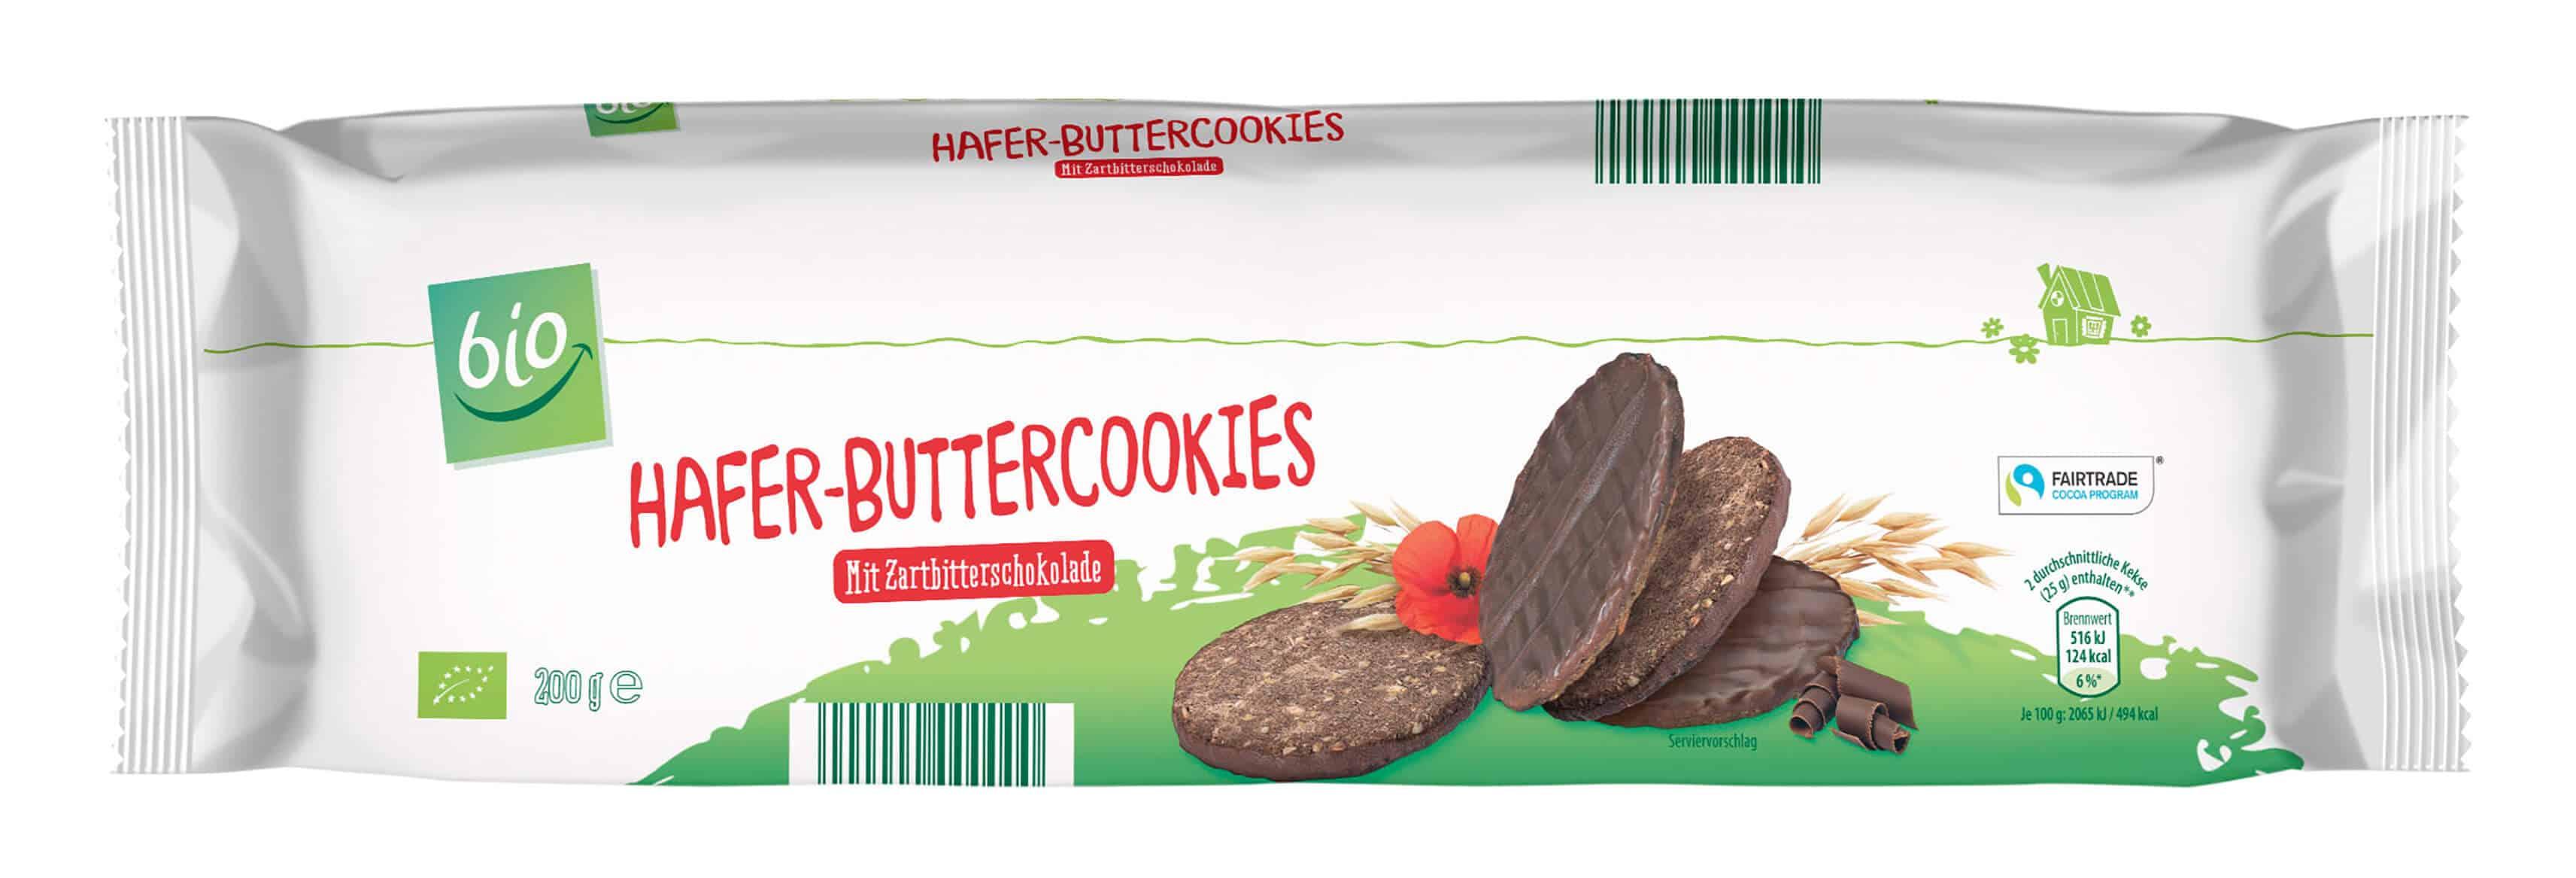 ALDI SÜD Bio Hafercookies Zartbitterschokolade